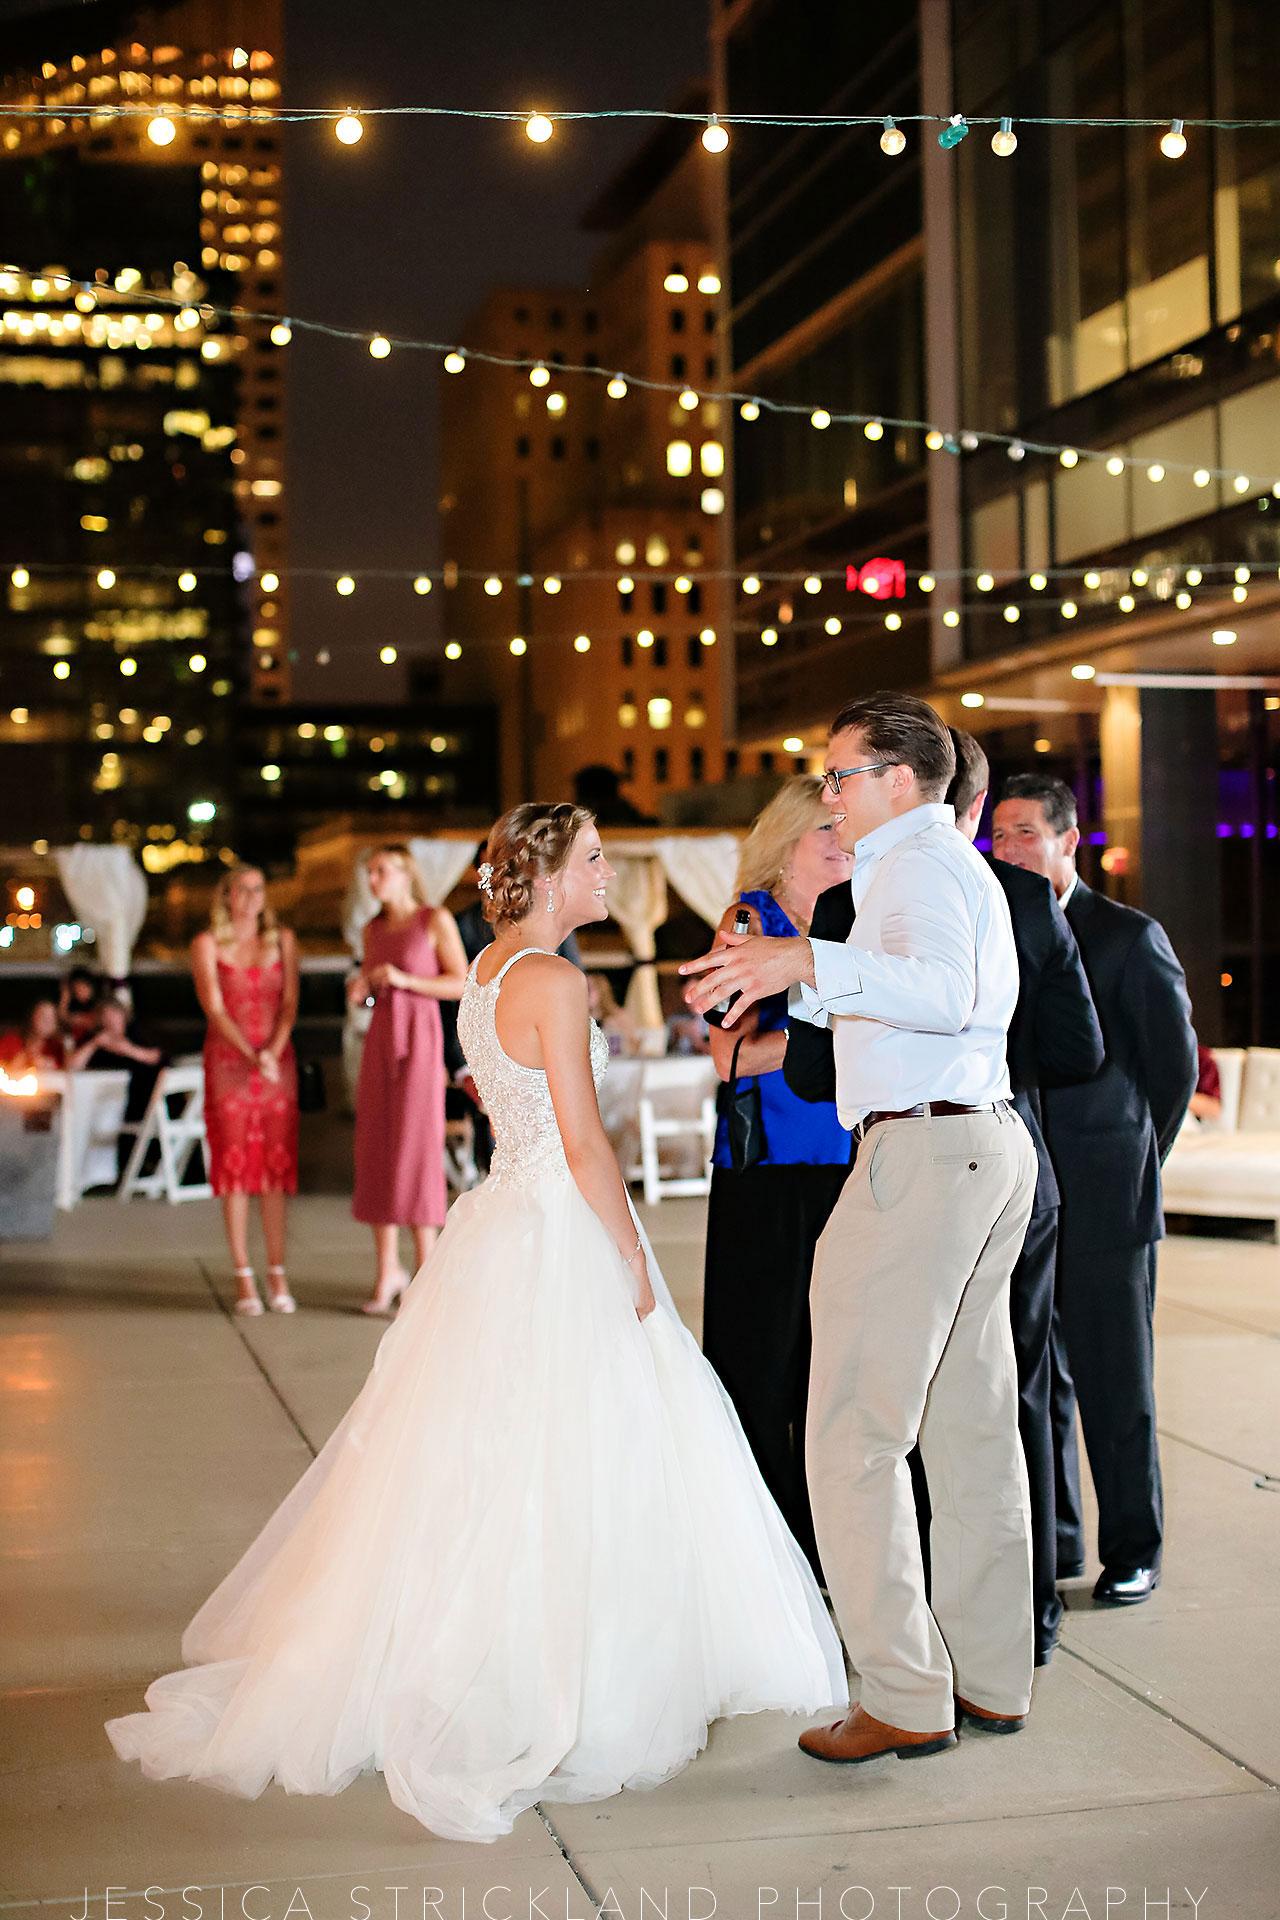 Serra Alex Regions Tower Indianapolis Wedding 344 watermarked